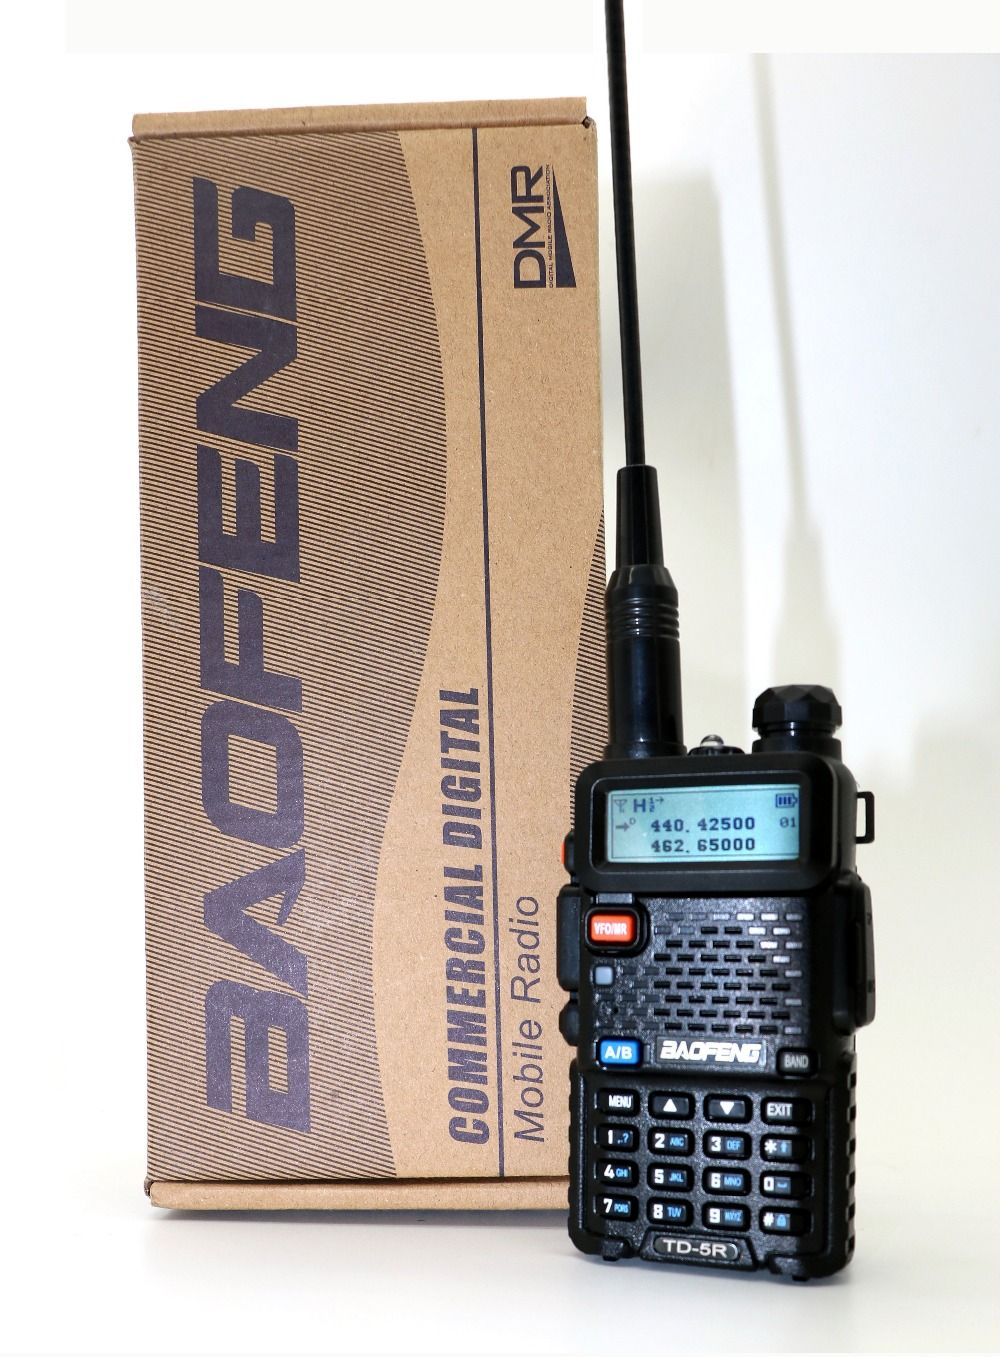 Baofeng Dual Time Slot TD-5R Portable Radio Dual Band tier2&tier1 DMR Walkie Taklie Digital Anolog dual mode DM-5R series Radio